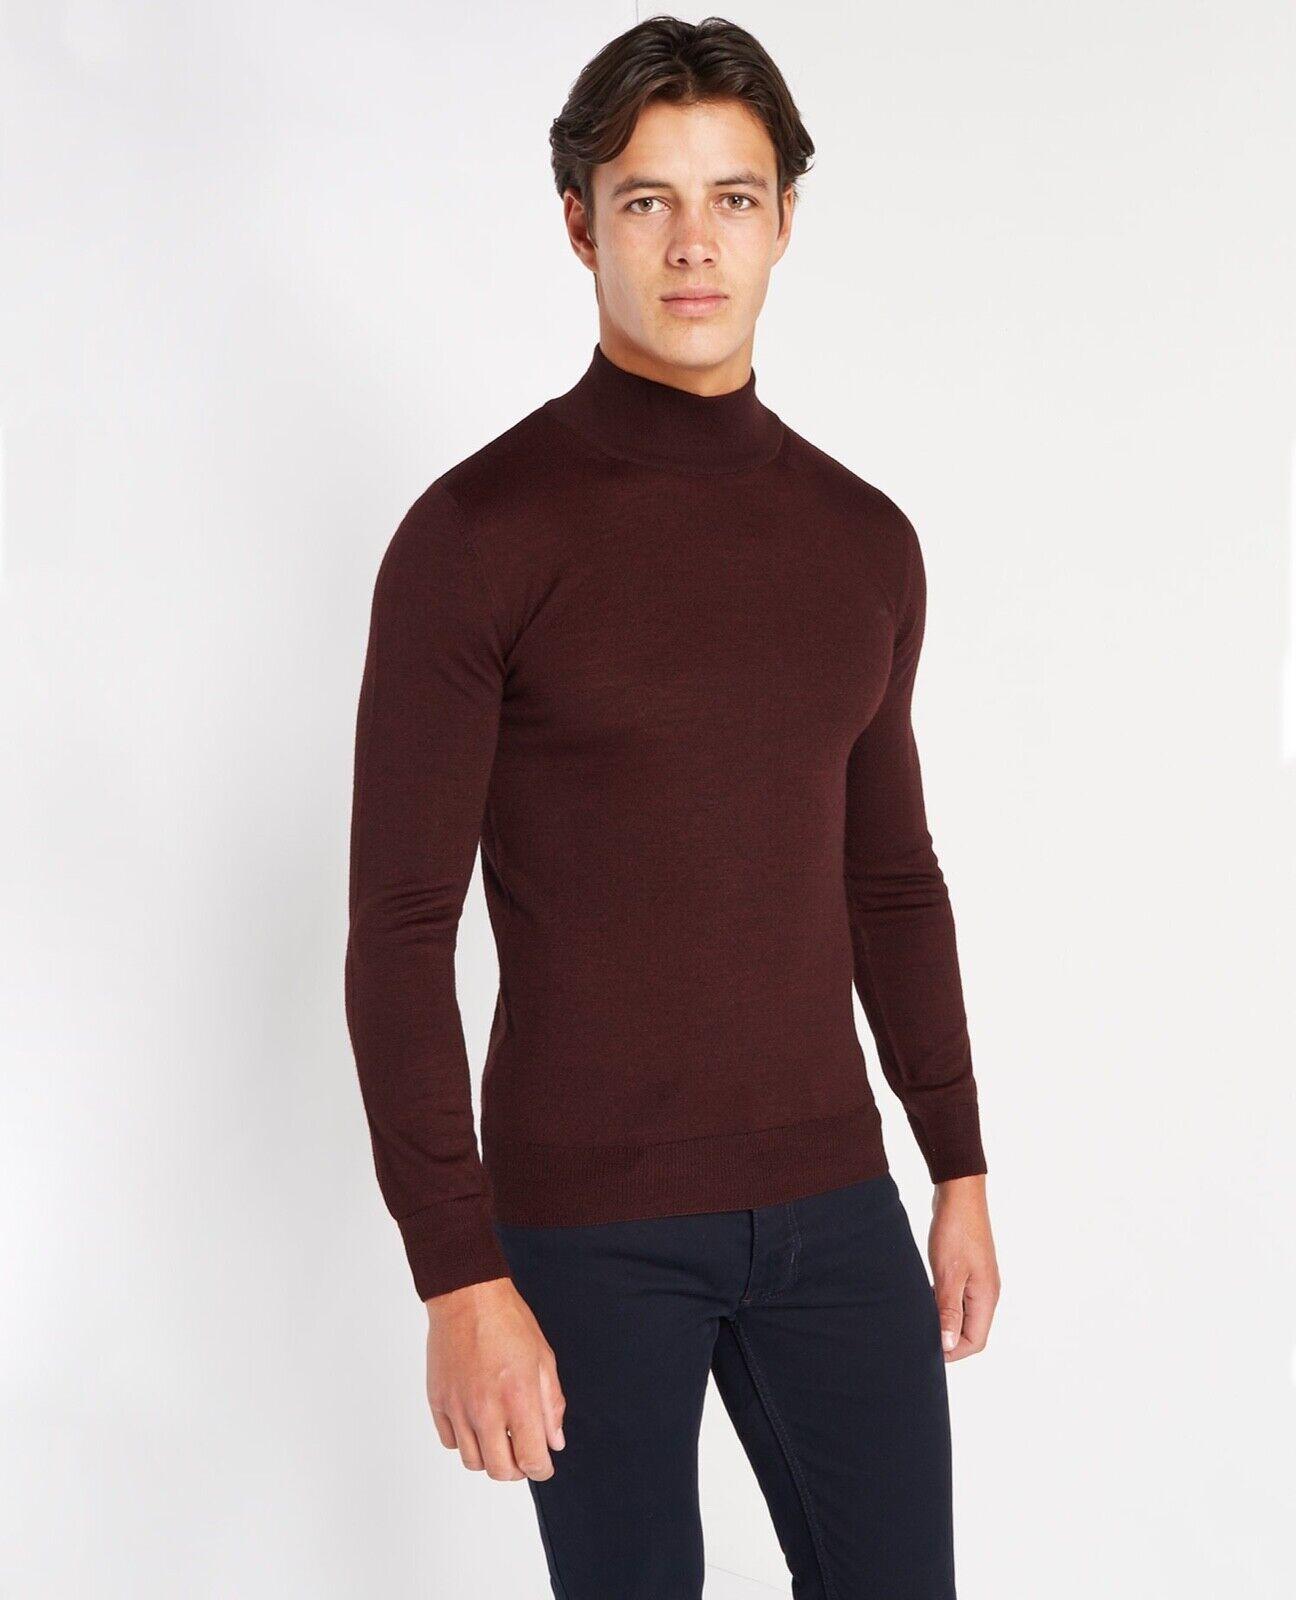 REMUS herren® Turtle Neck Sweater Wine - Large - AW18 SALE